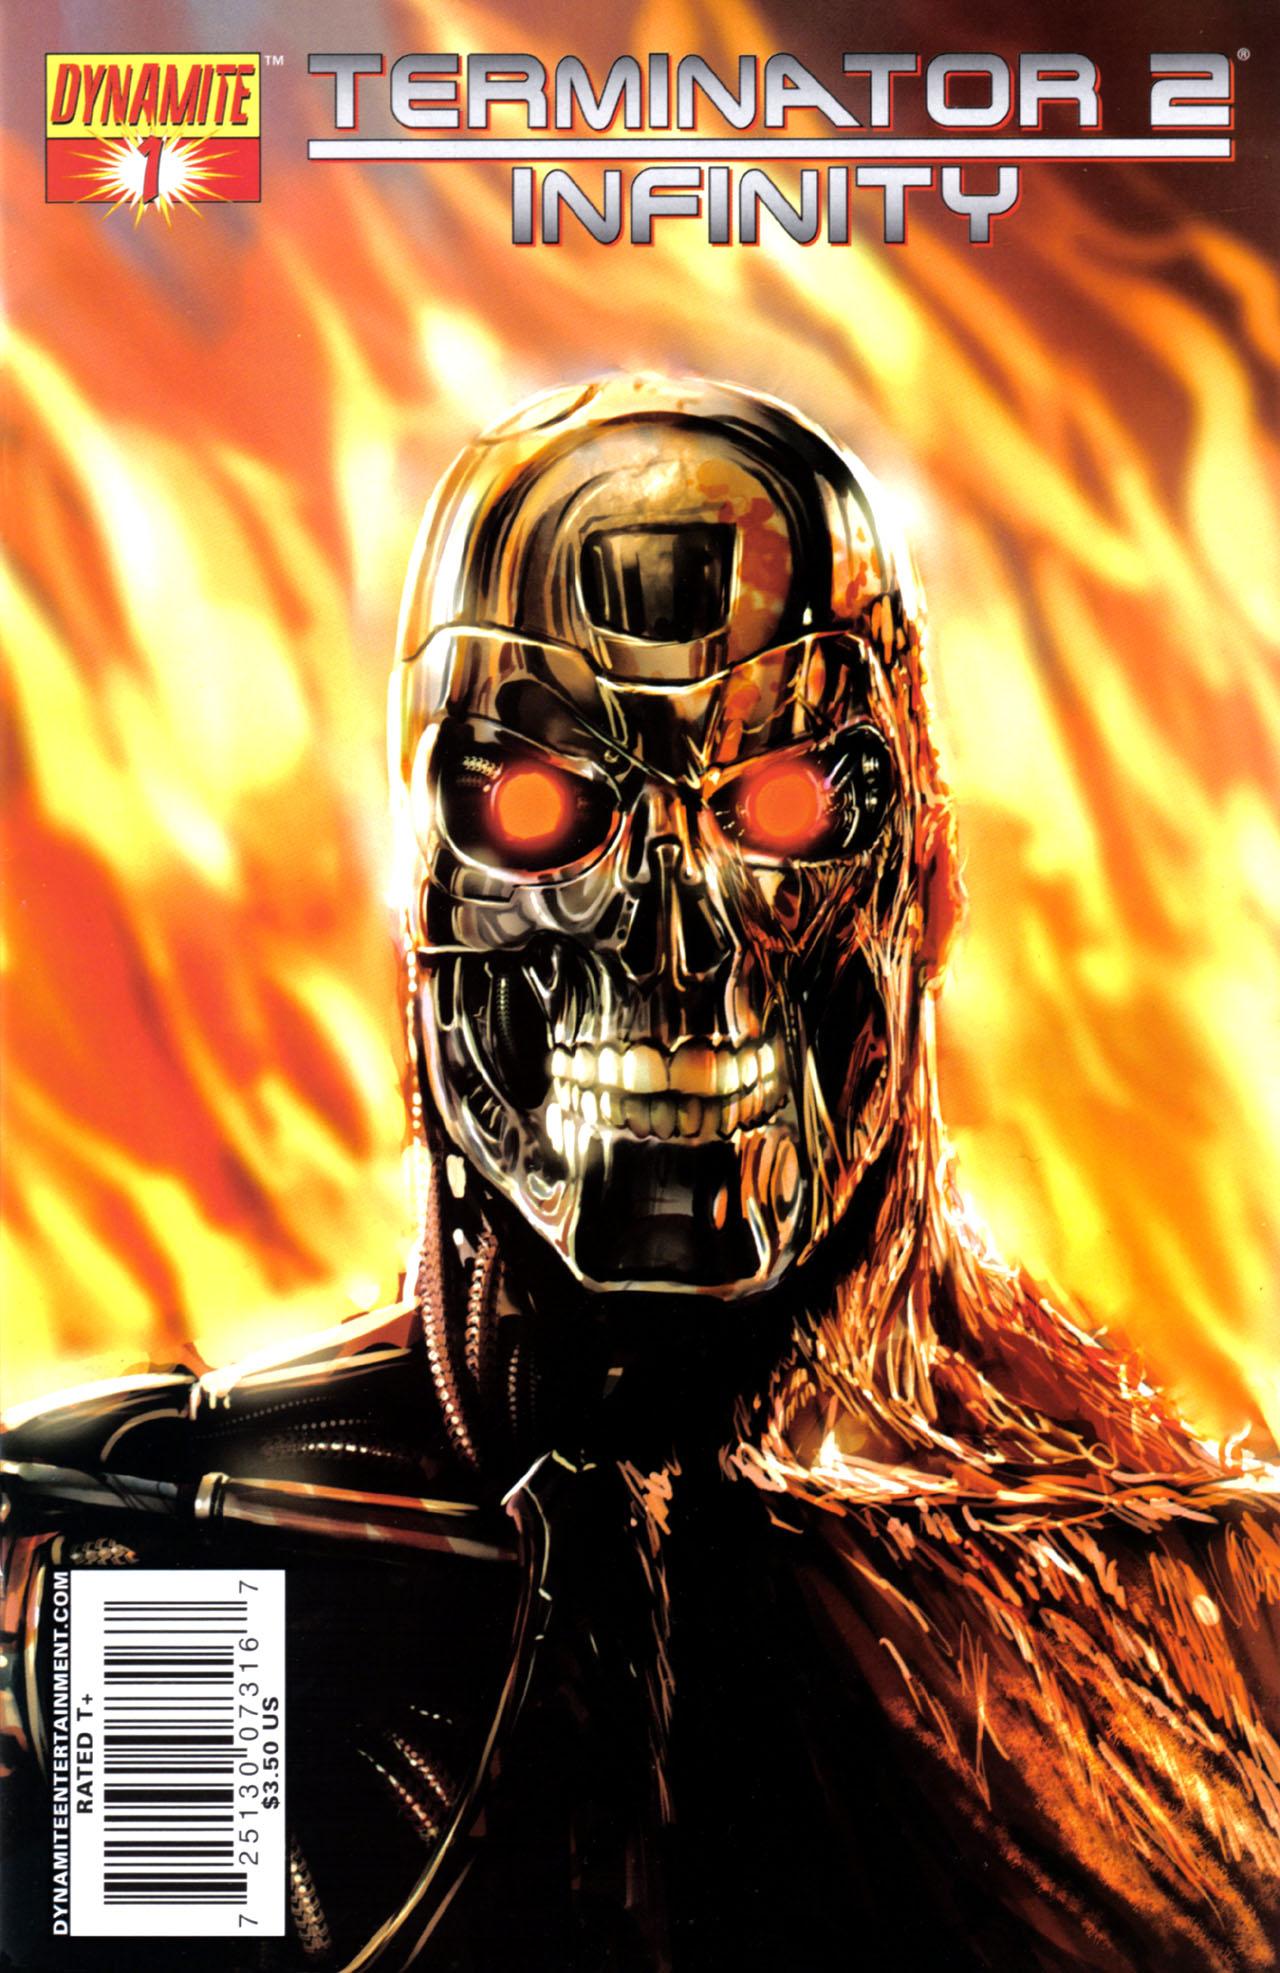 Terminator 5 Infinity Backgrounds on Wallpapers Vista